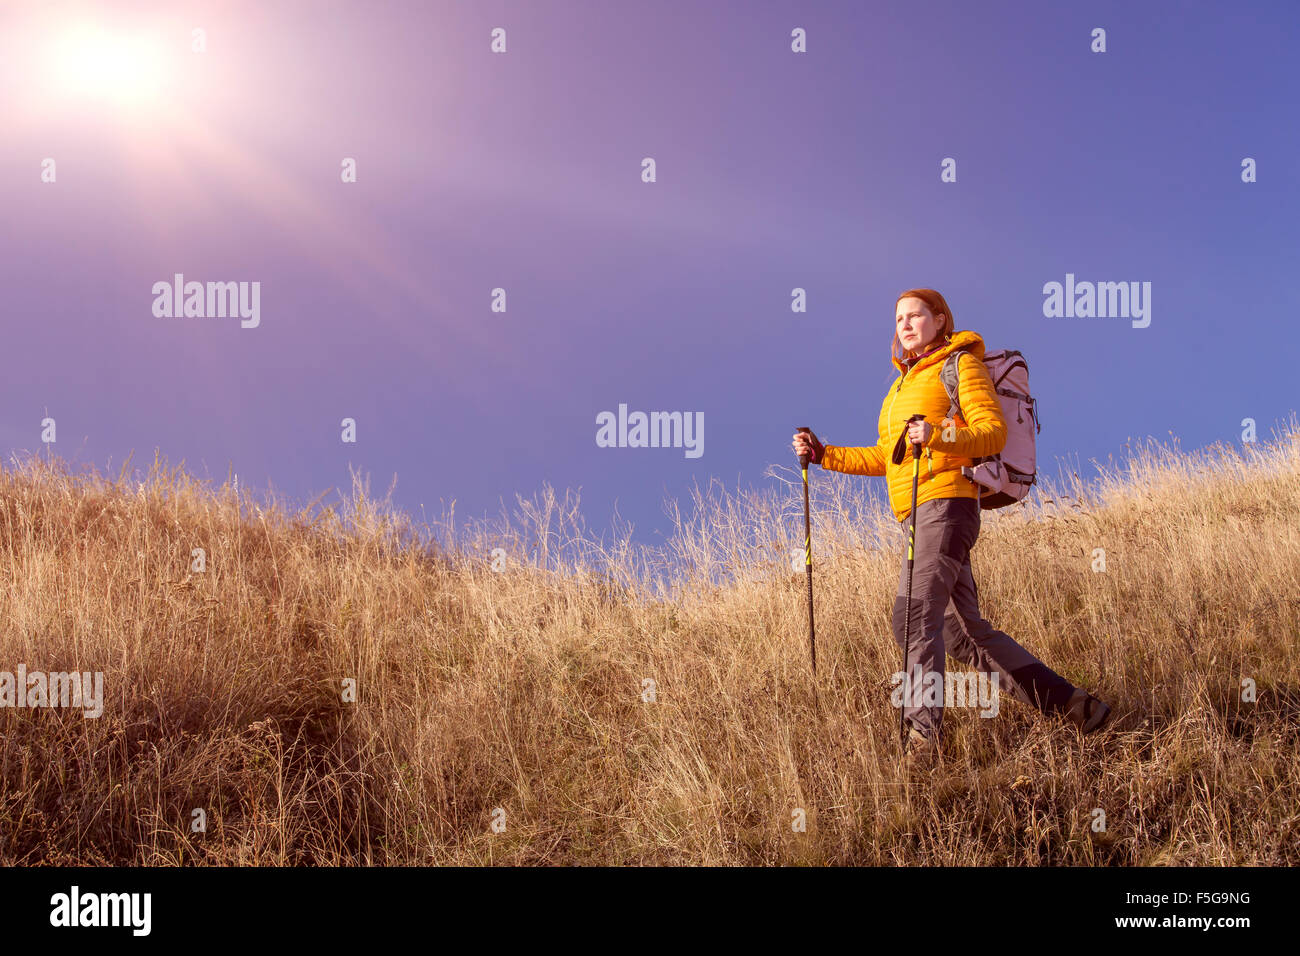 Female hiker walking on grassy hill - Stock Image